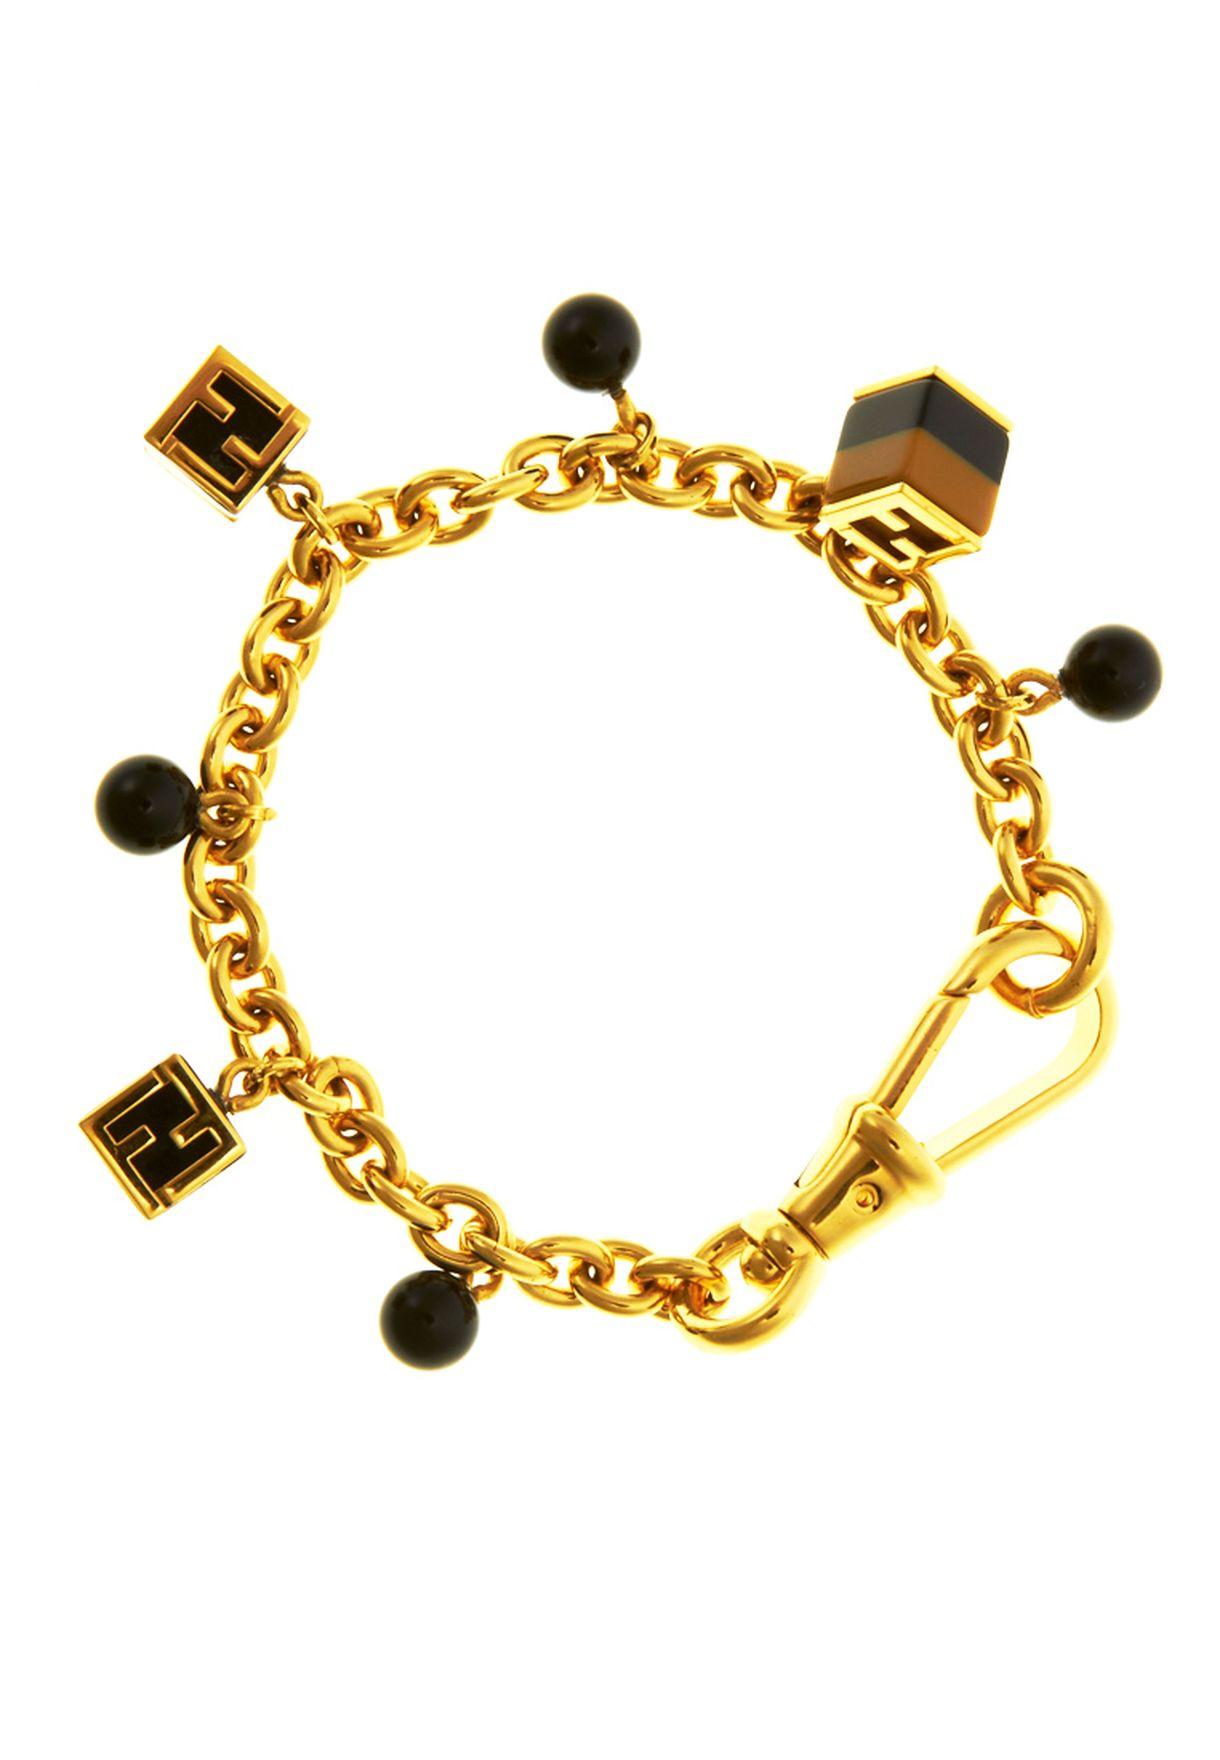 e2d8c9cce تسوق Bracelet ماركة فندي لون ذهبي في السعودية - FE270AC84RGP